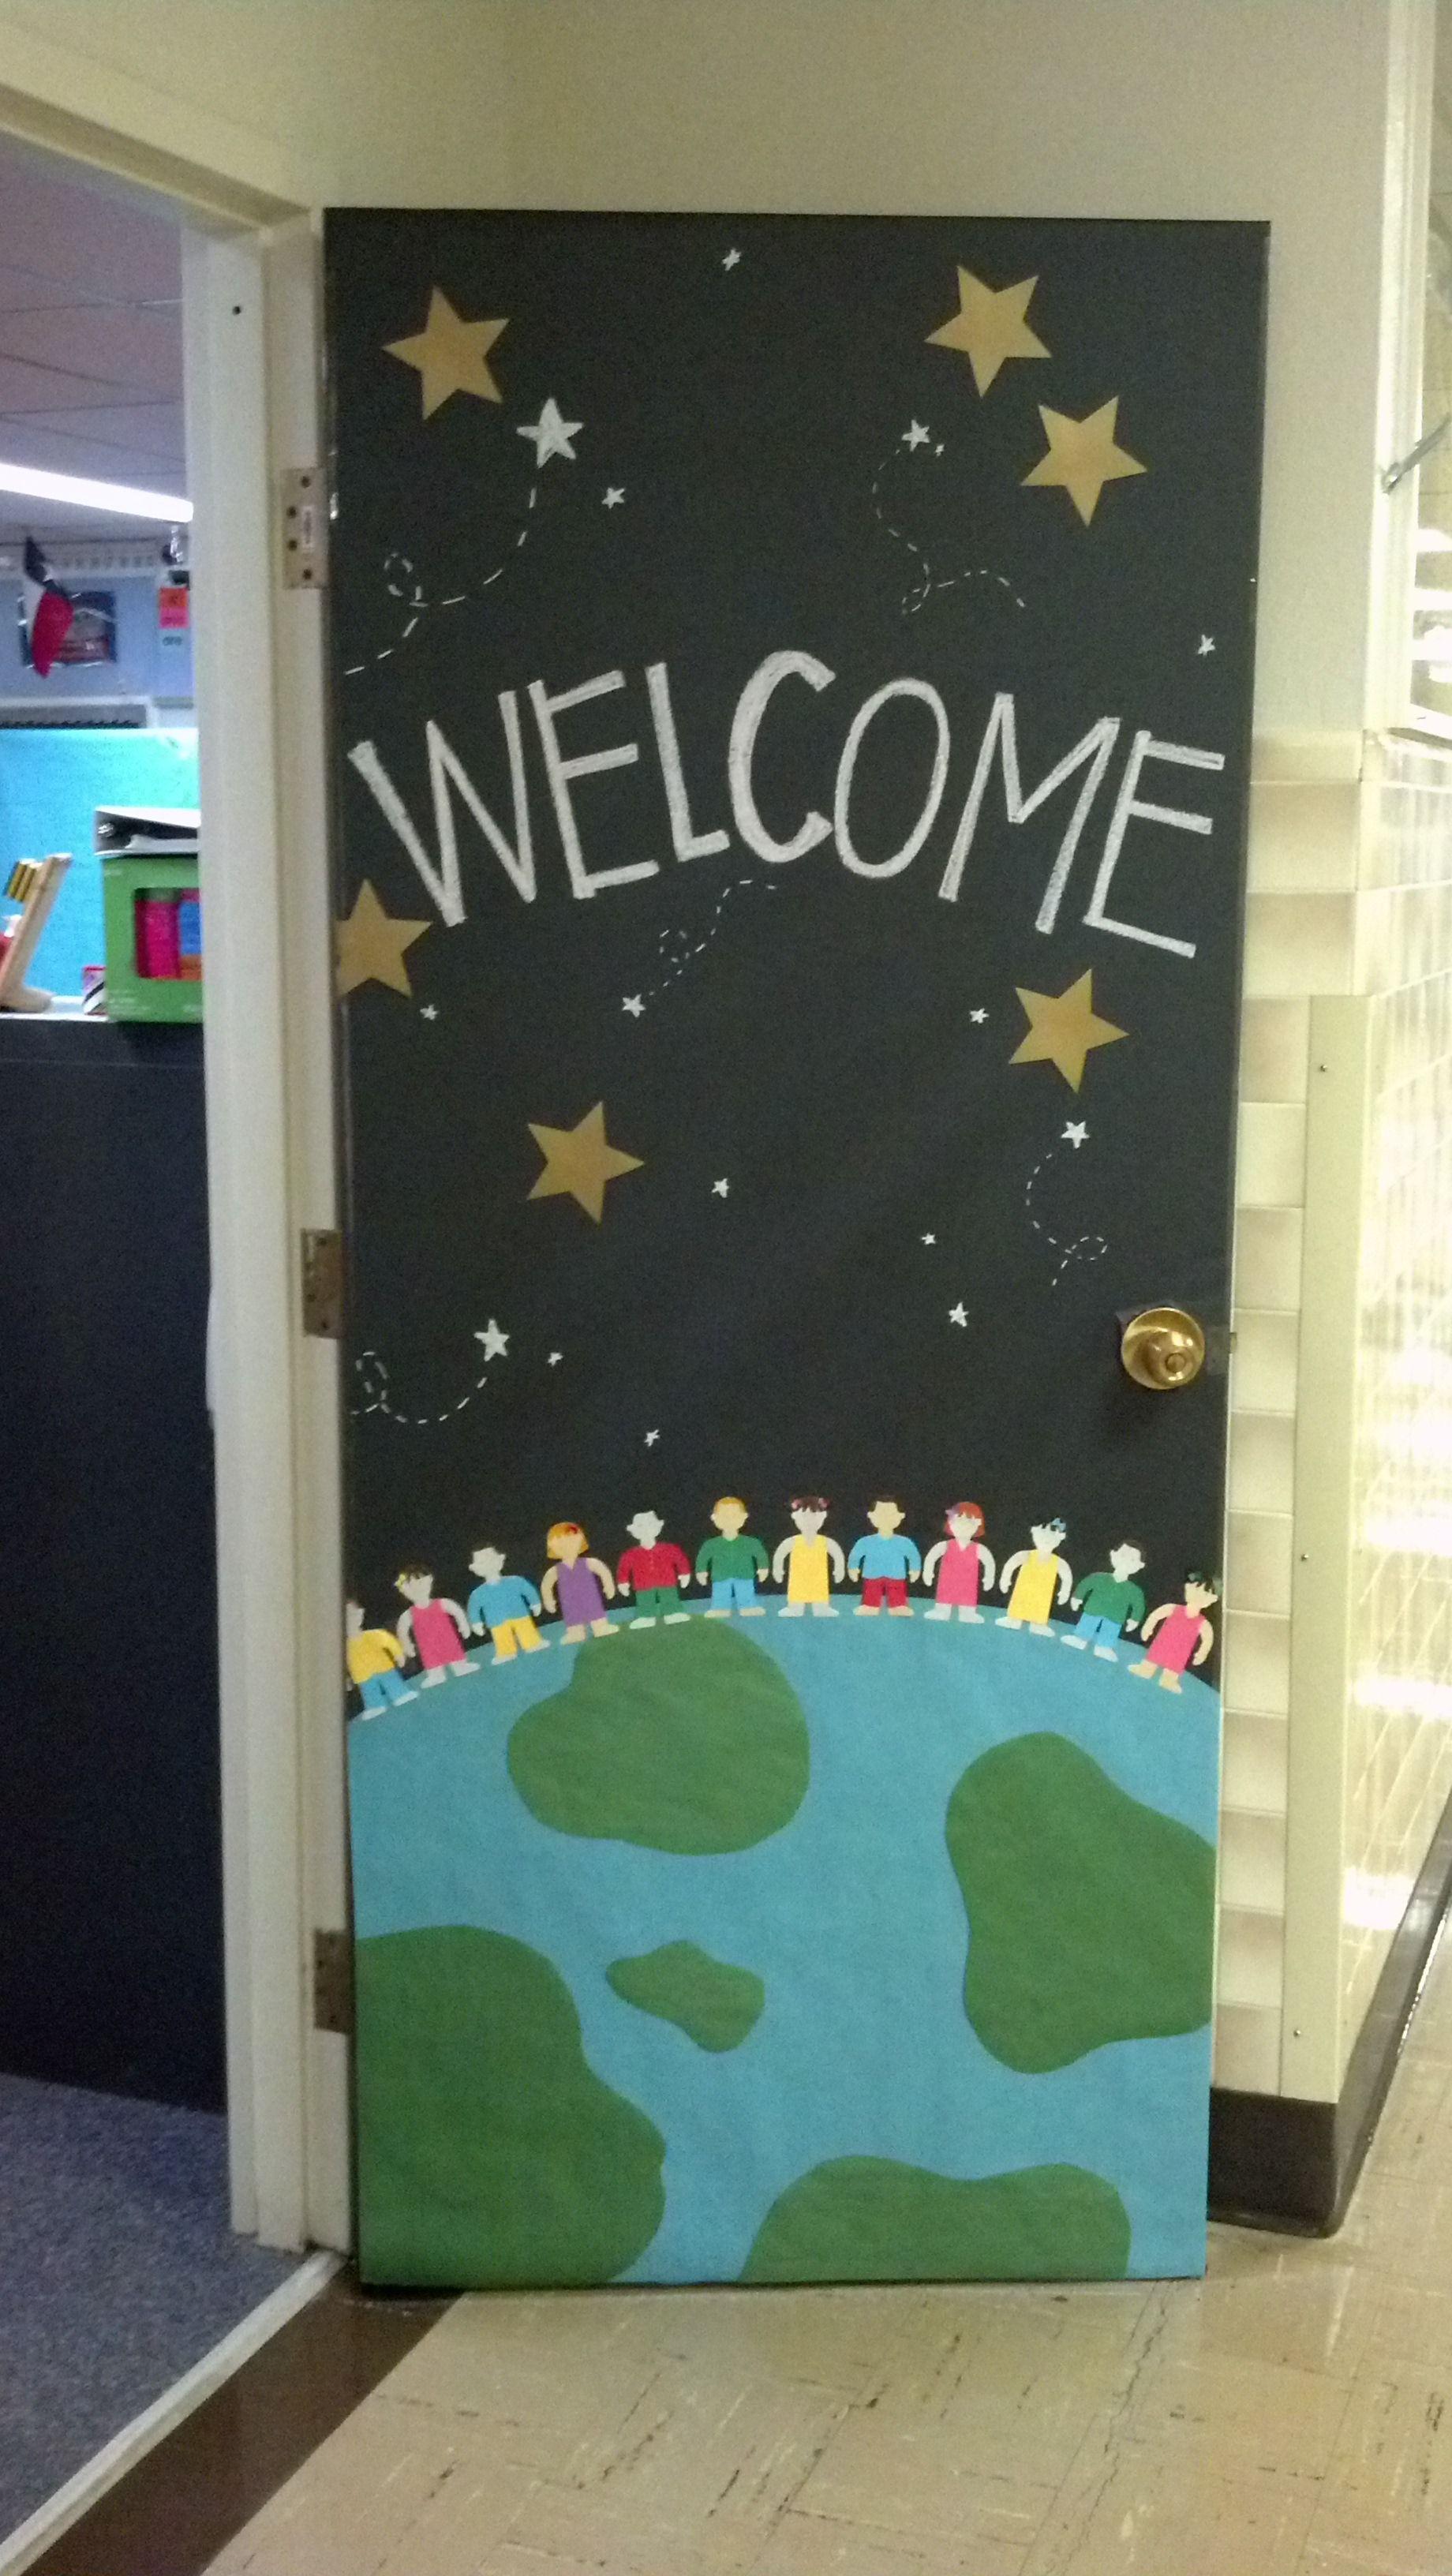 Bienvenida decoraci n del aula y organizaci n aula for Decoracion puerta aula infantil